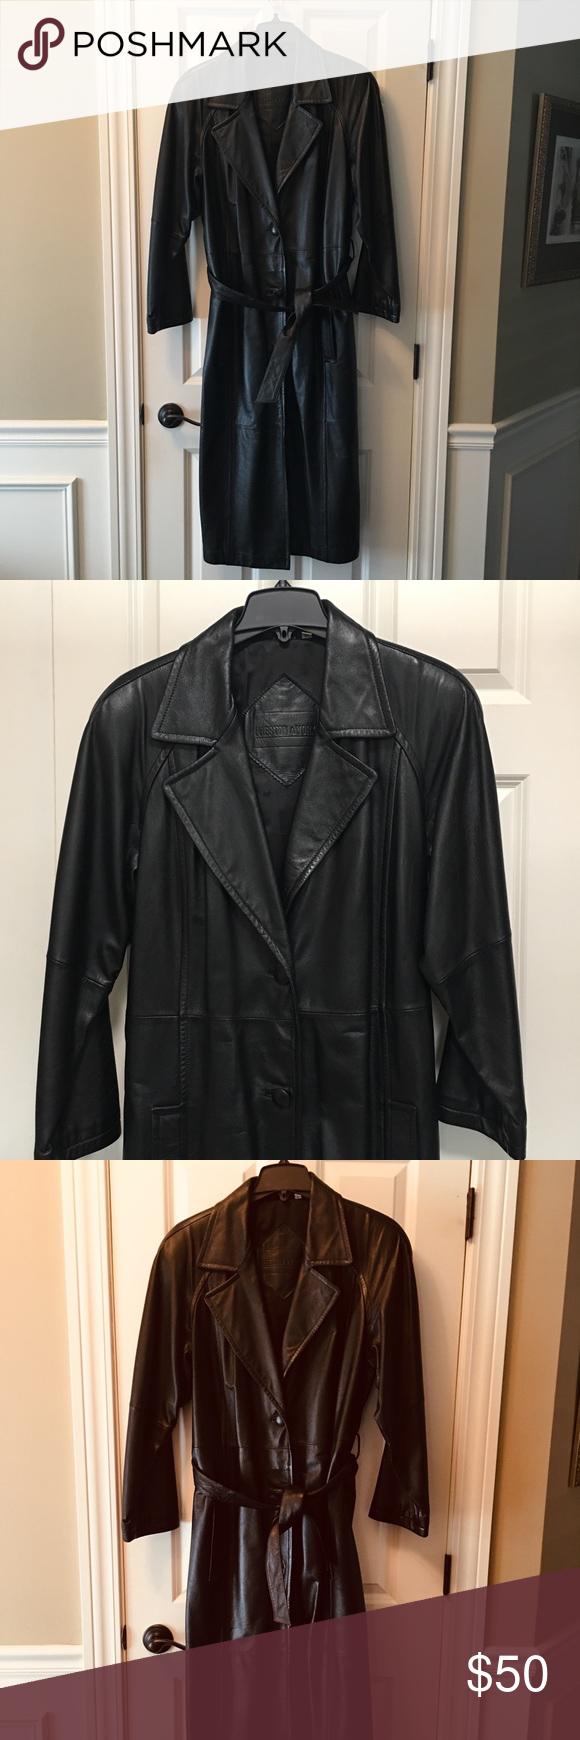 Genuine Leather Coat My Posh Closet Pinterest Coat Leather